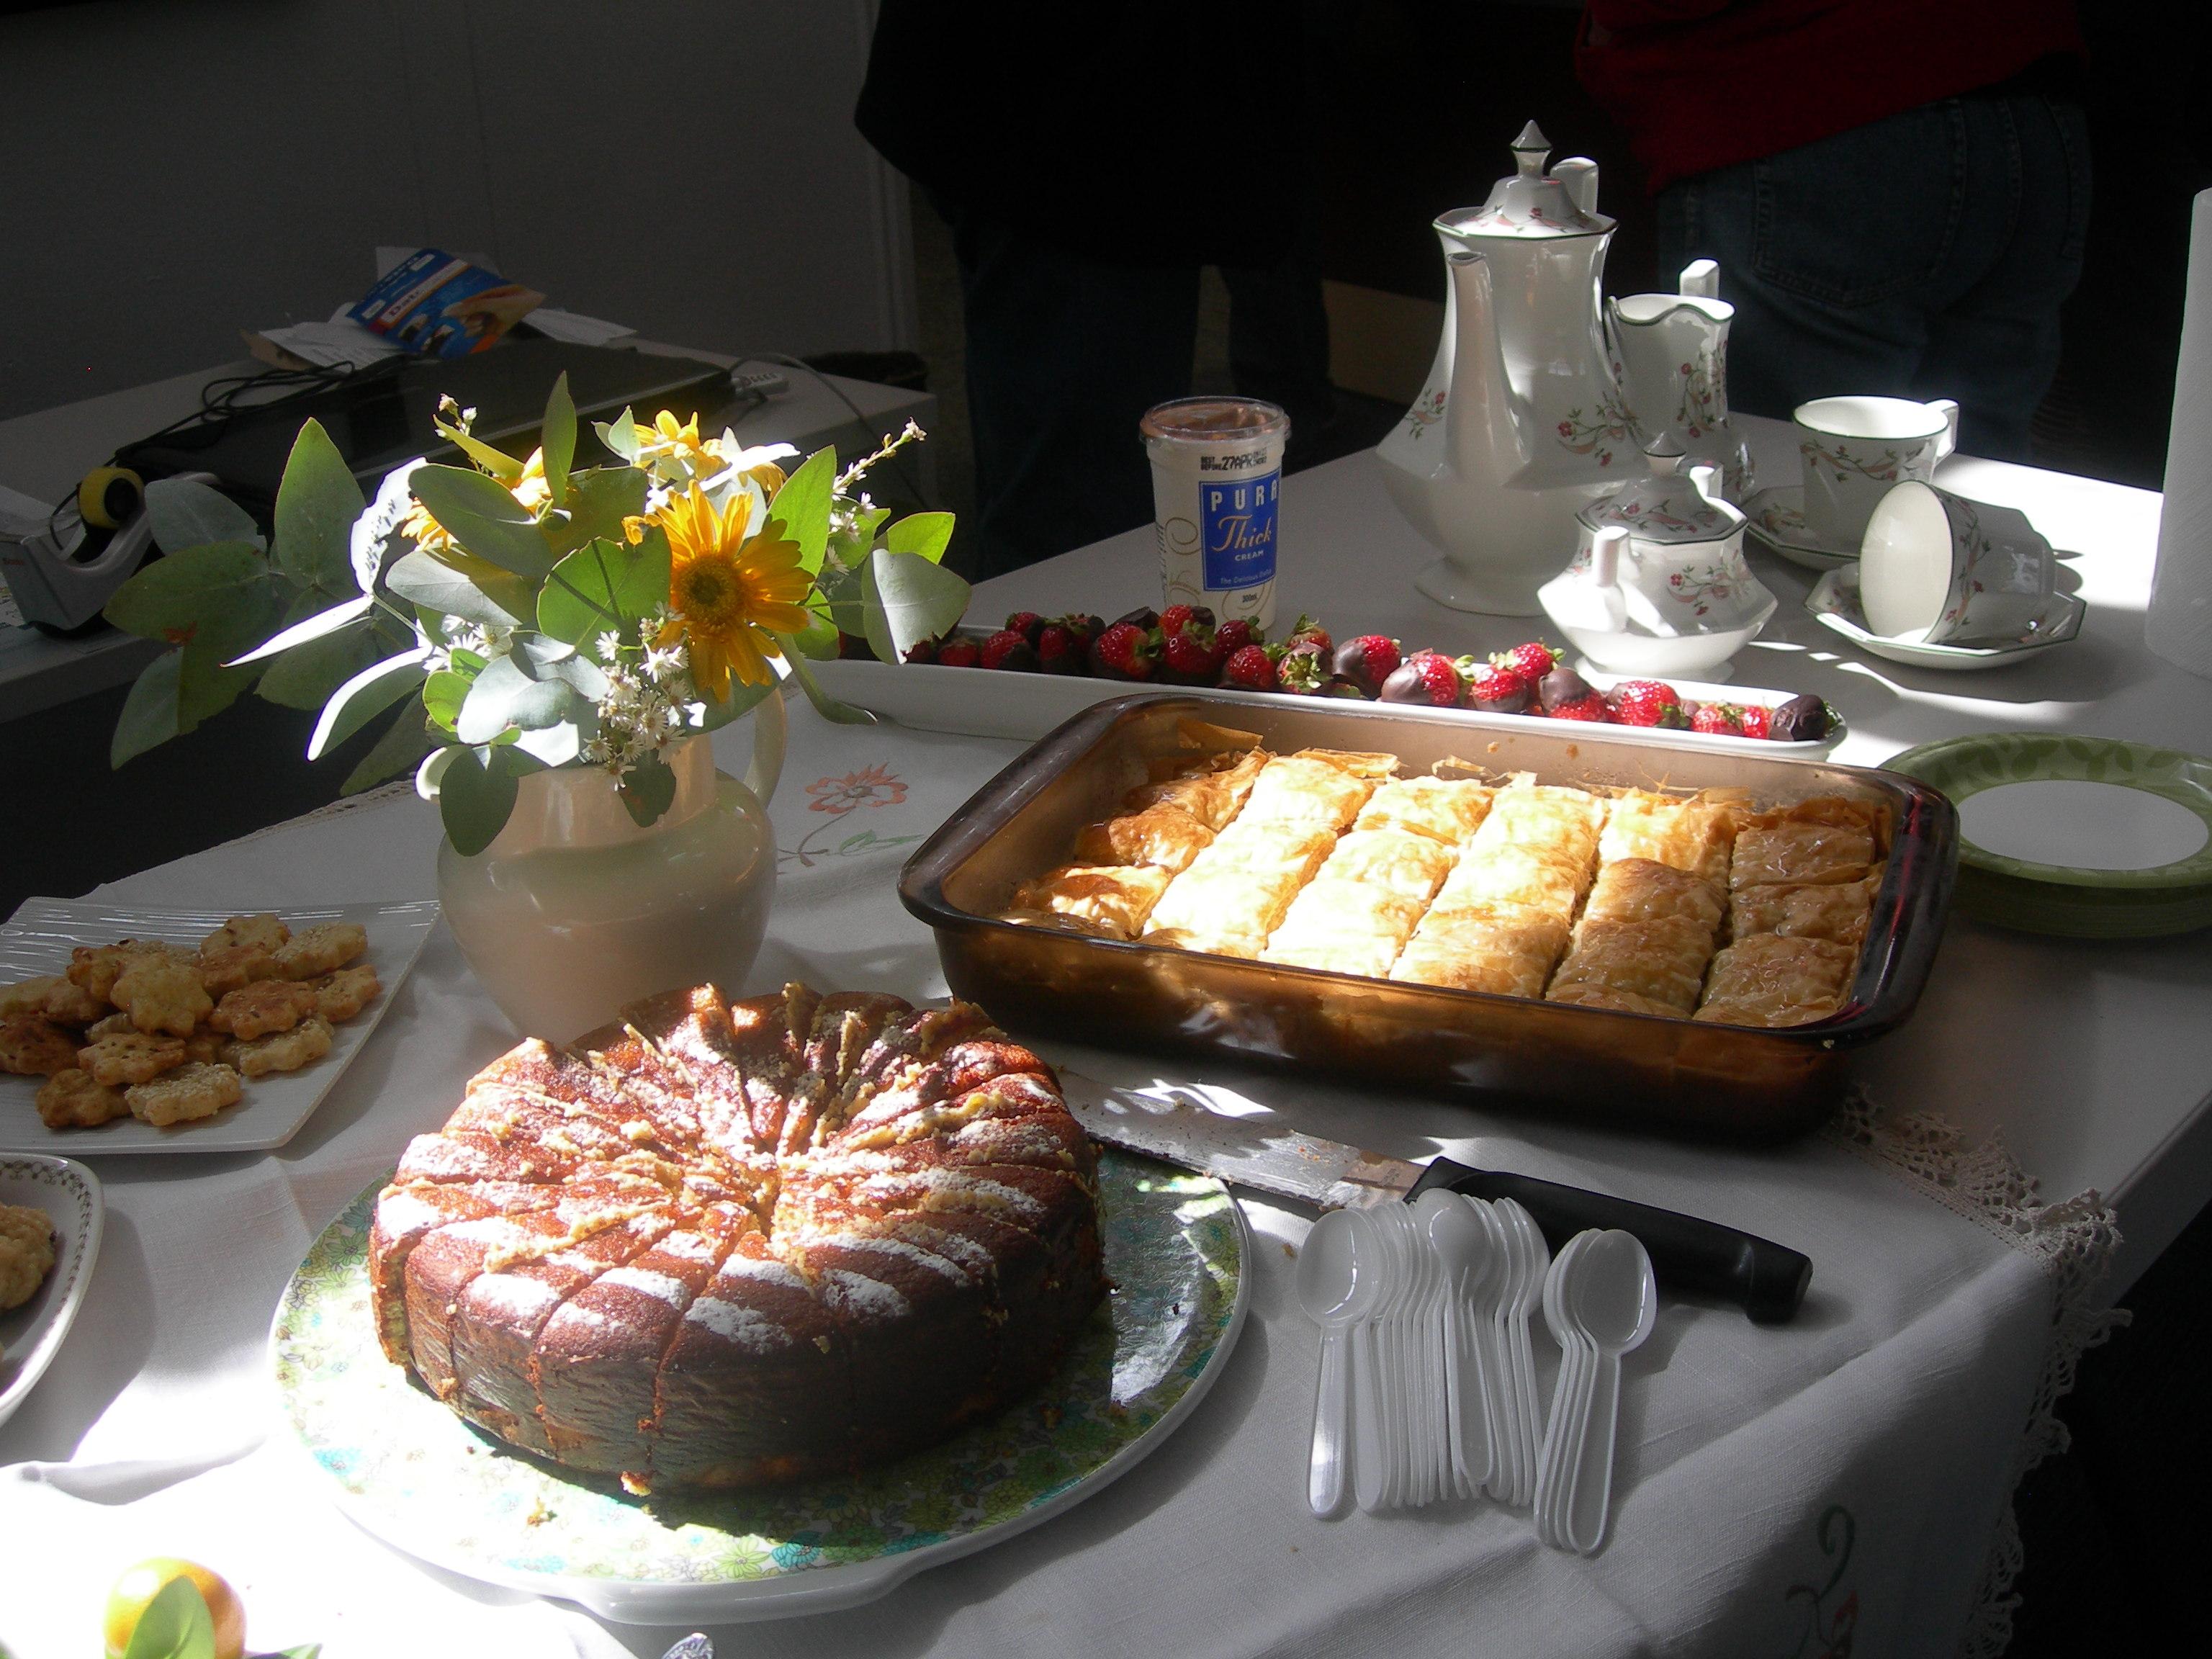 morning meditation tea table - photo #1